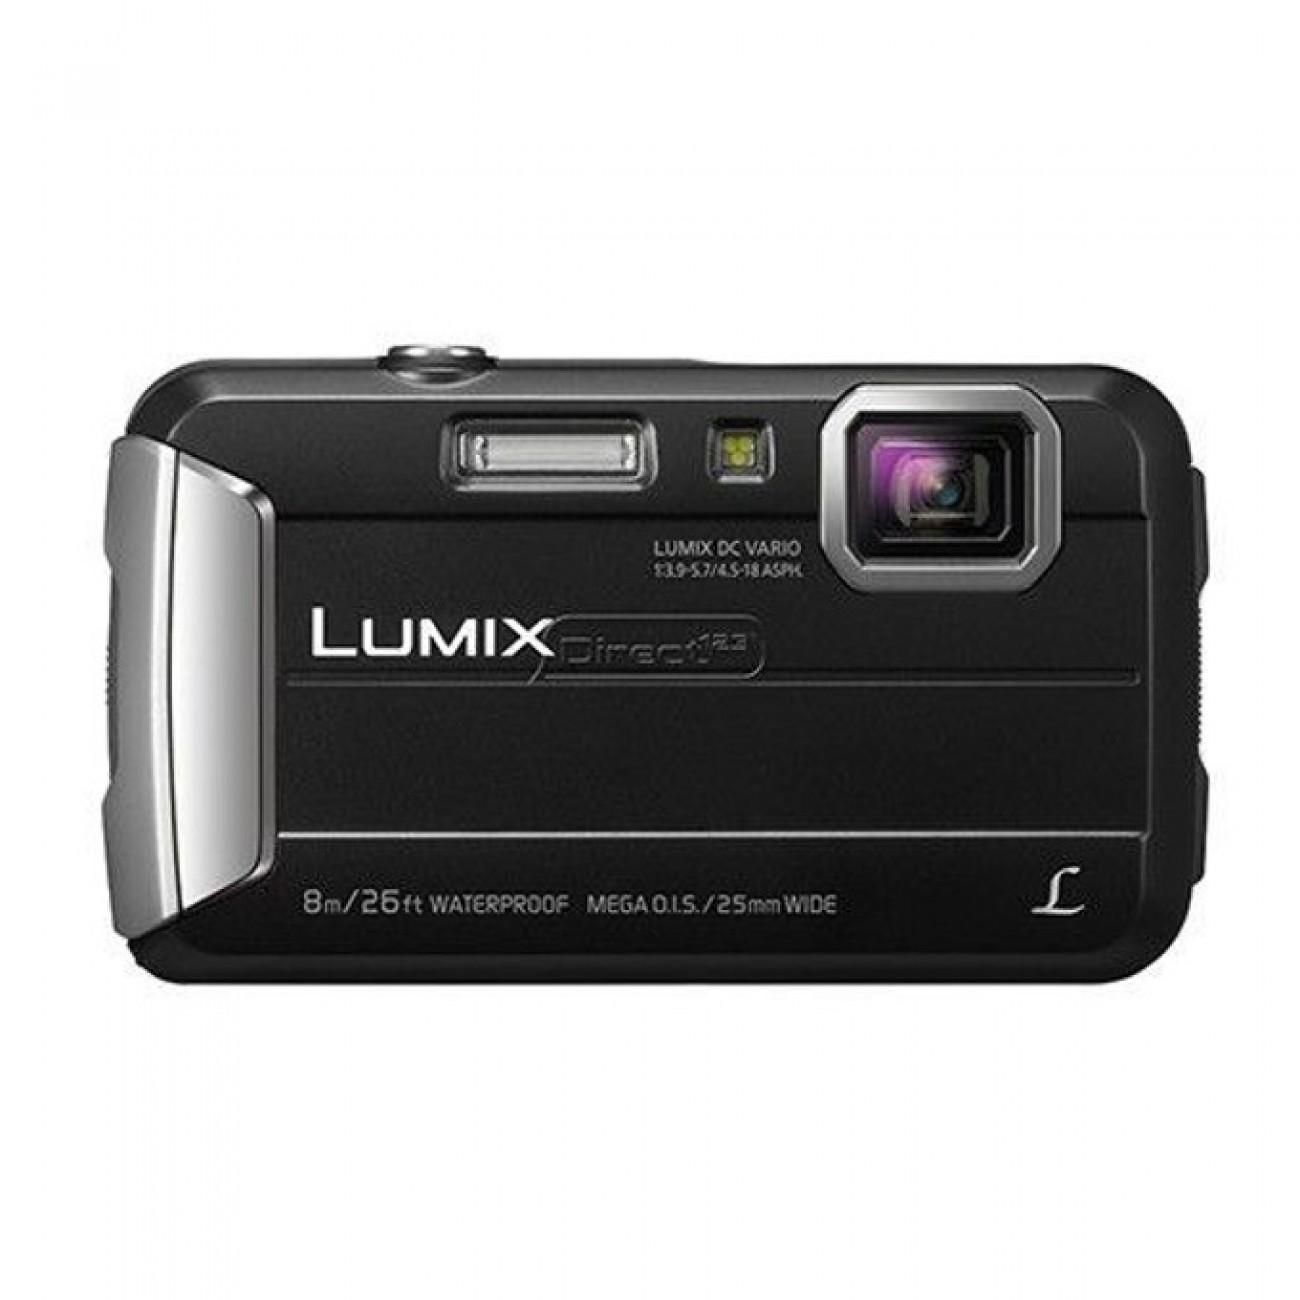 Фотоапарат Panasonic DMC-FT30EP, 4x оптично увеличение, 16.1 MPix, 2.7(6.85cm) LCD дисплей, SD card слот, AV изход, USB в Фотоапарати - Panasonic | Alleop